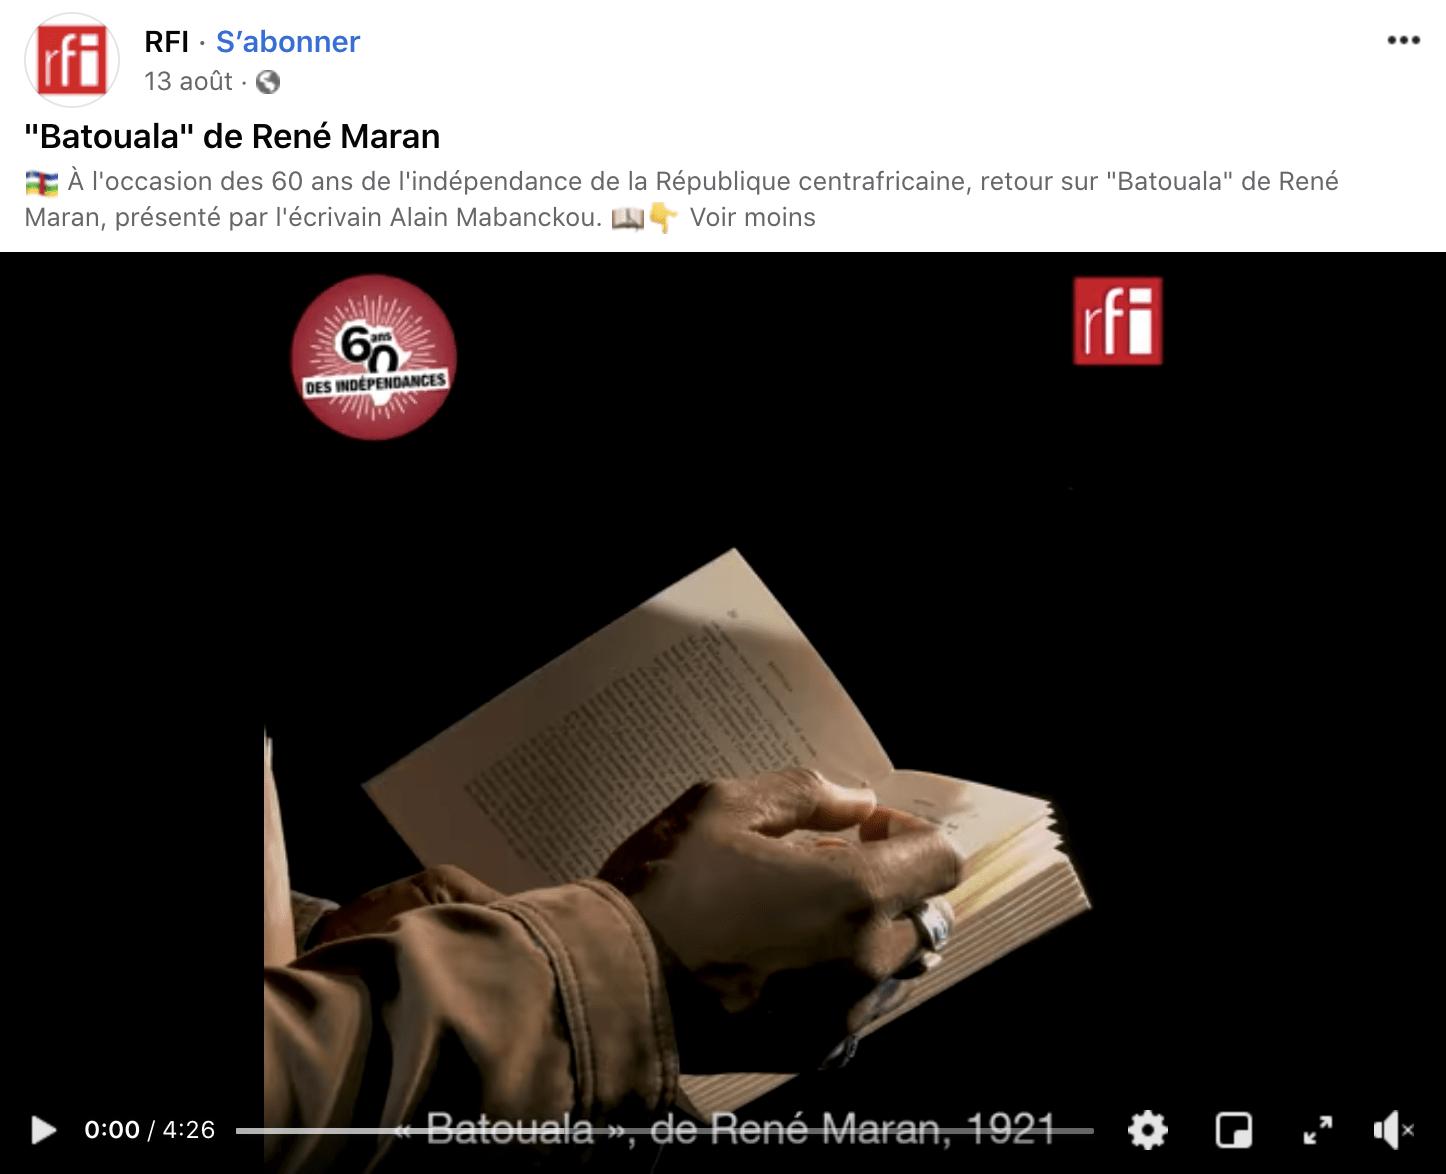 Emission d'Alain Mabanckou sur RFI